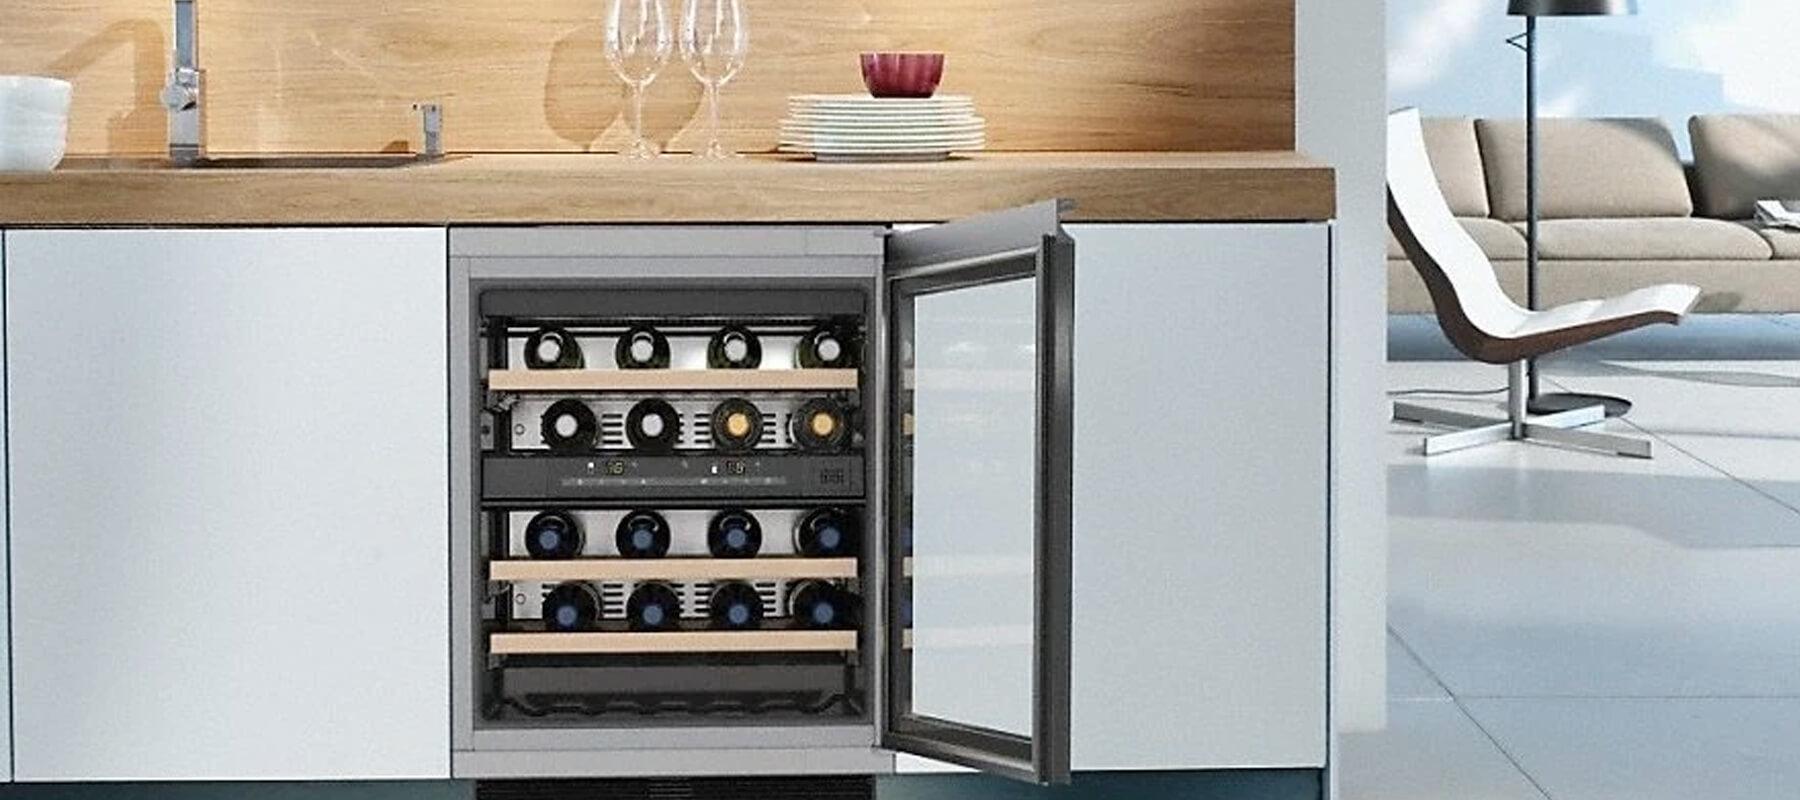 Built in Counter Depth Refrigerator La Costa   Built-in Refrigerator Repair